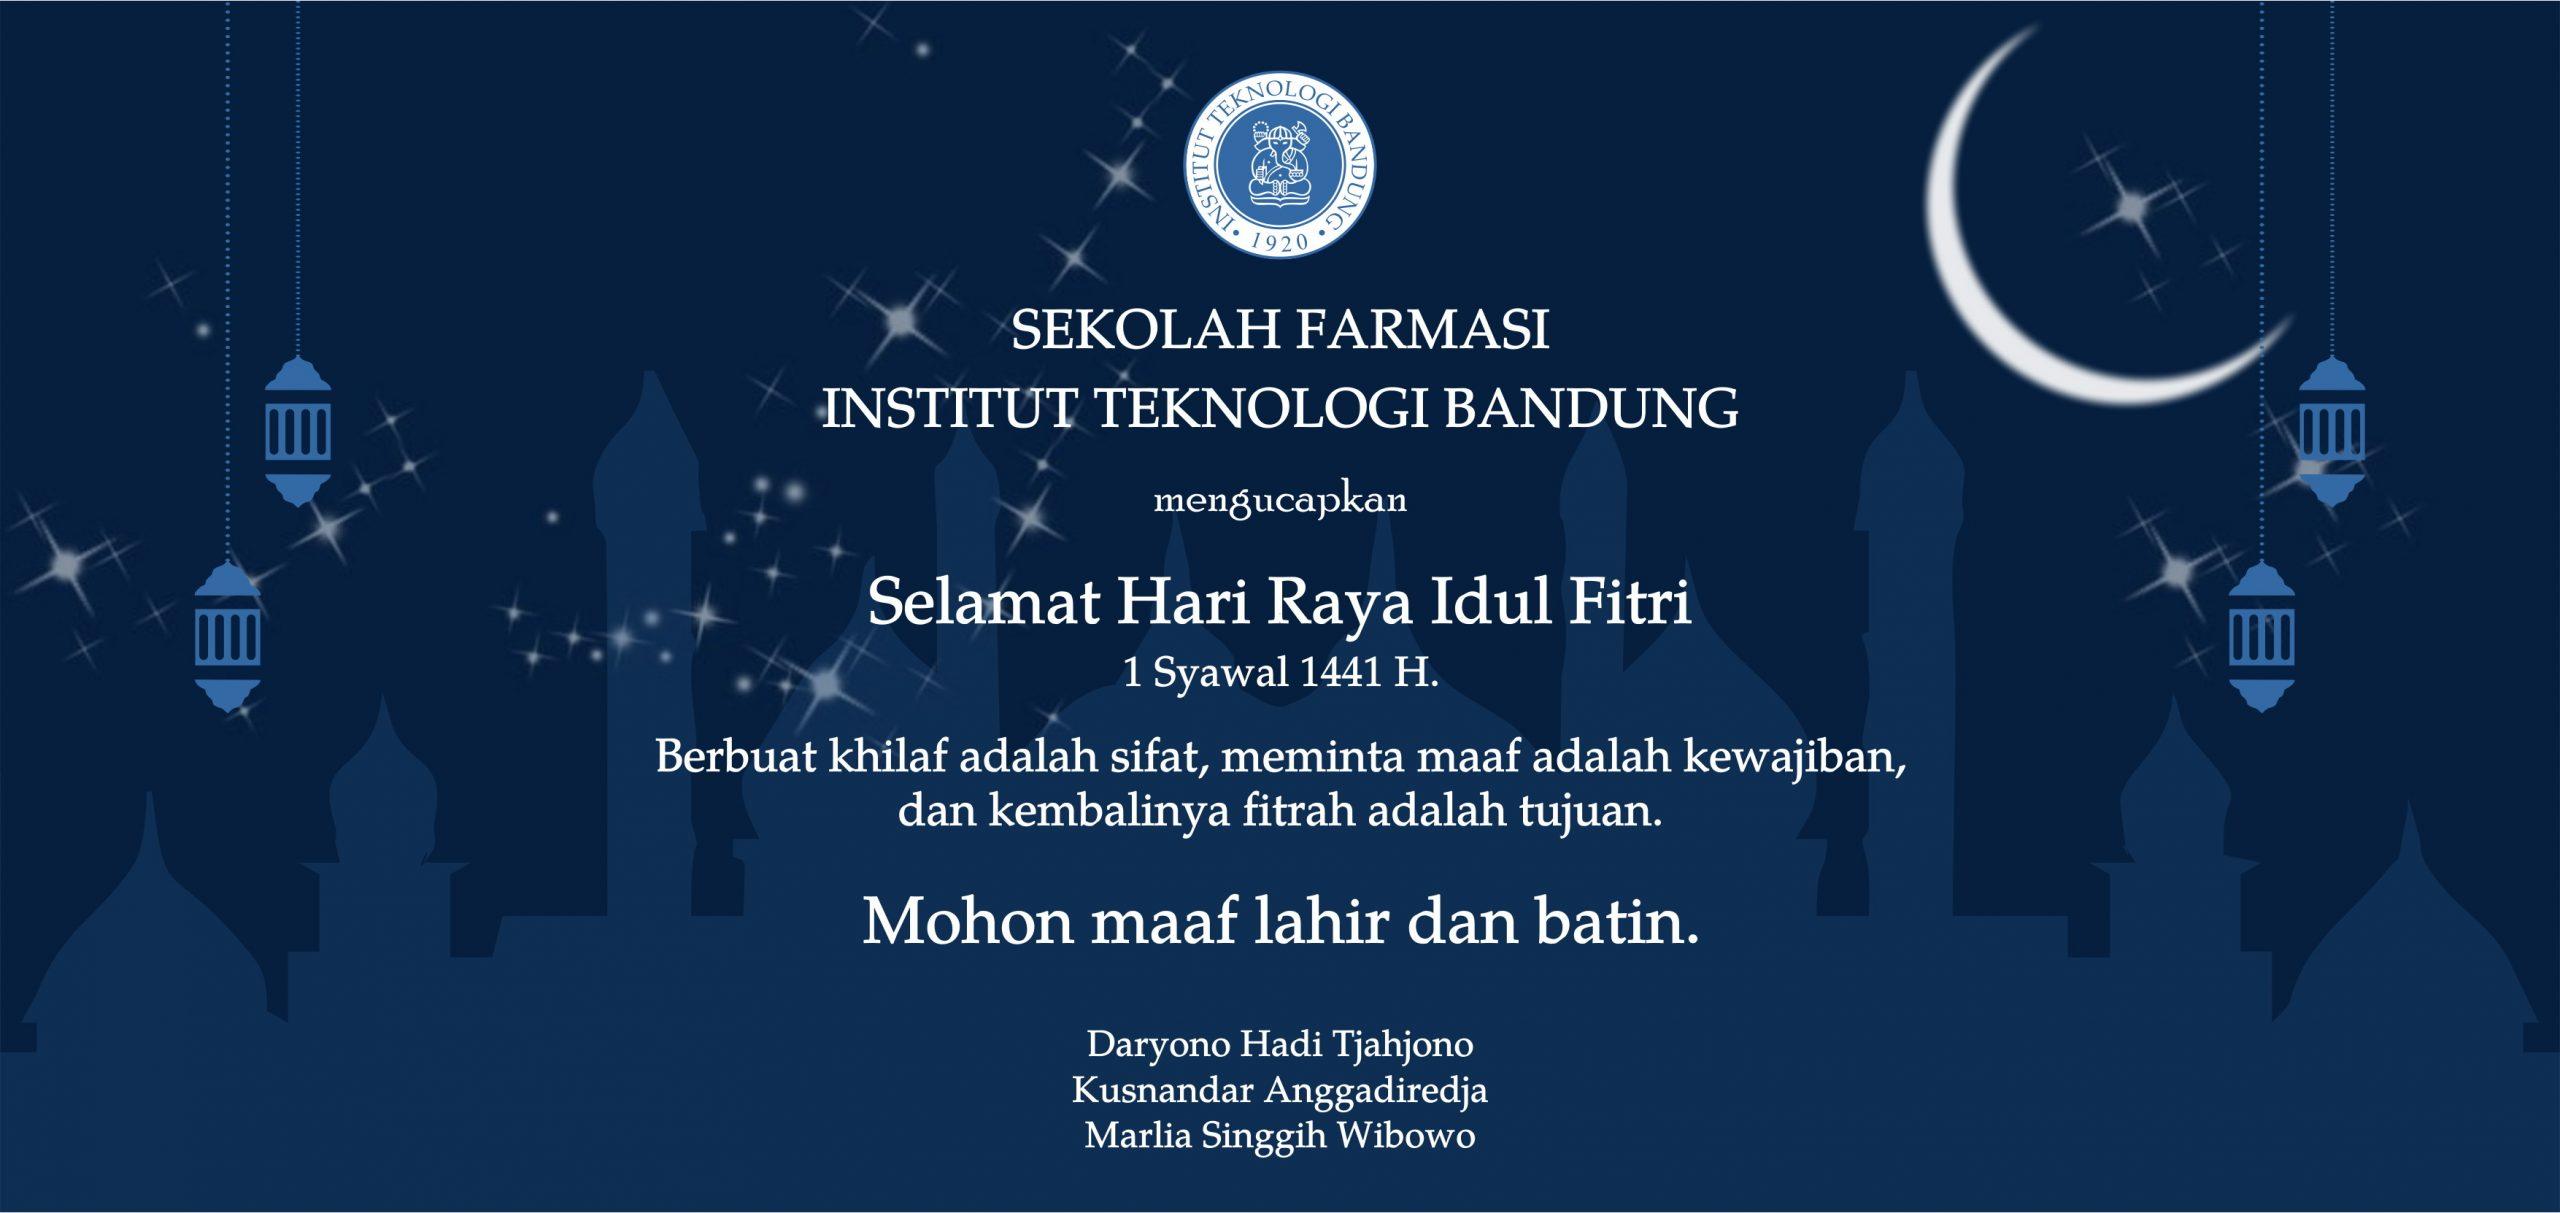 Selamat Idul Fitri 1441 H.